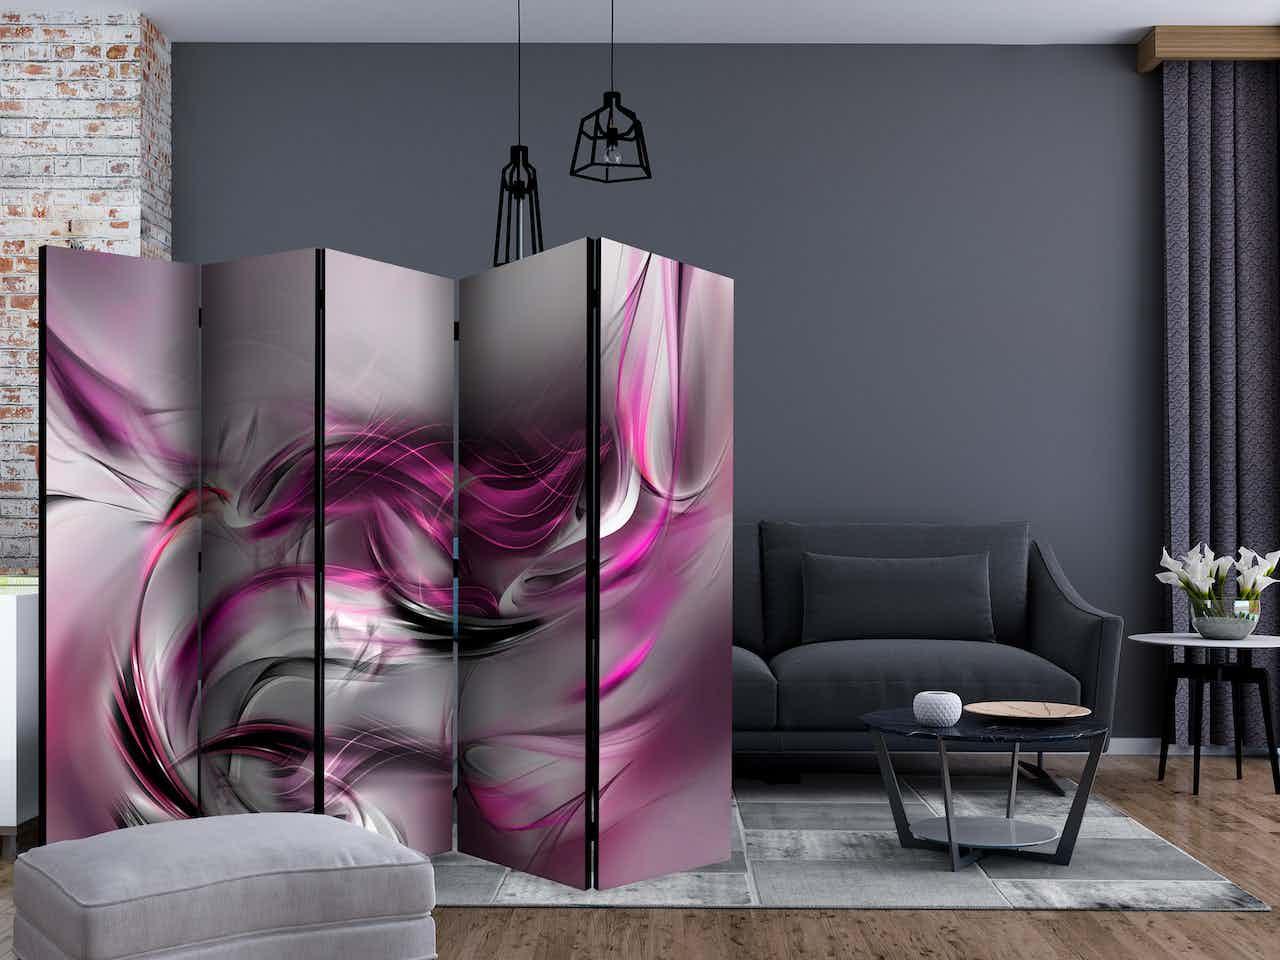 5-teiliges Paravent - Pink Swirls II II [Room Dividers]